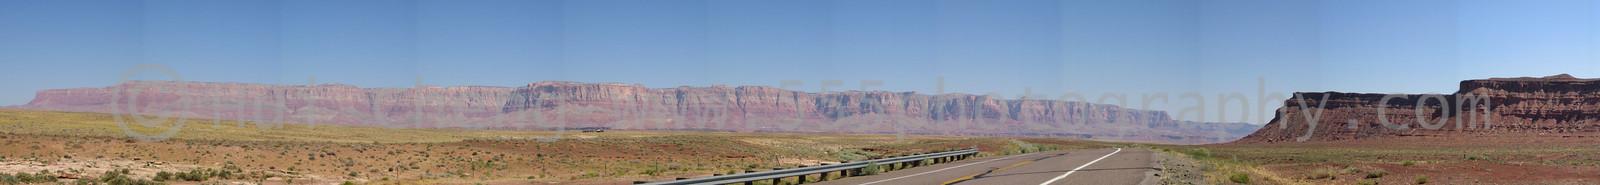 Road Trip - IL to CA